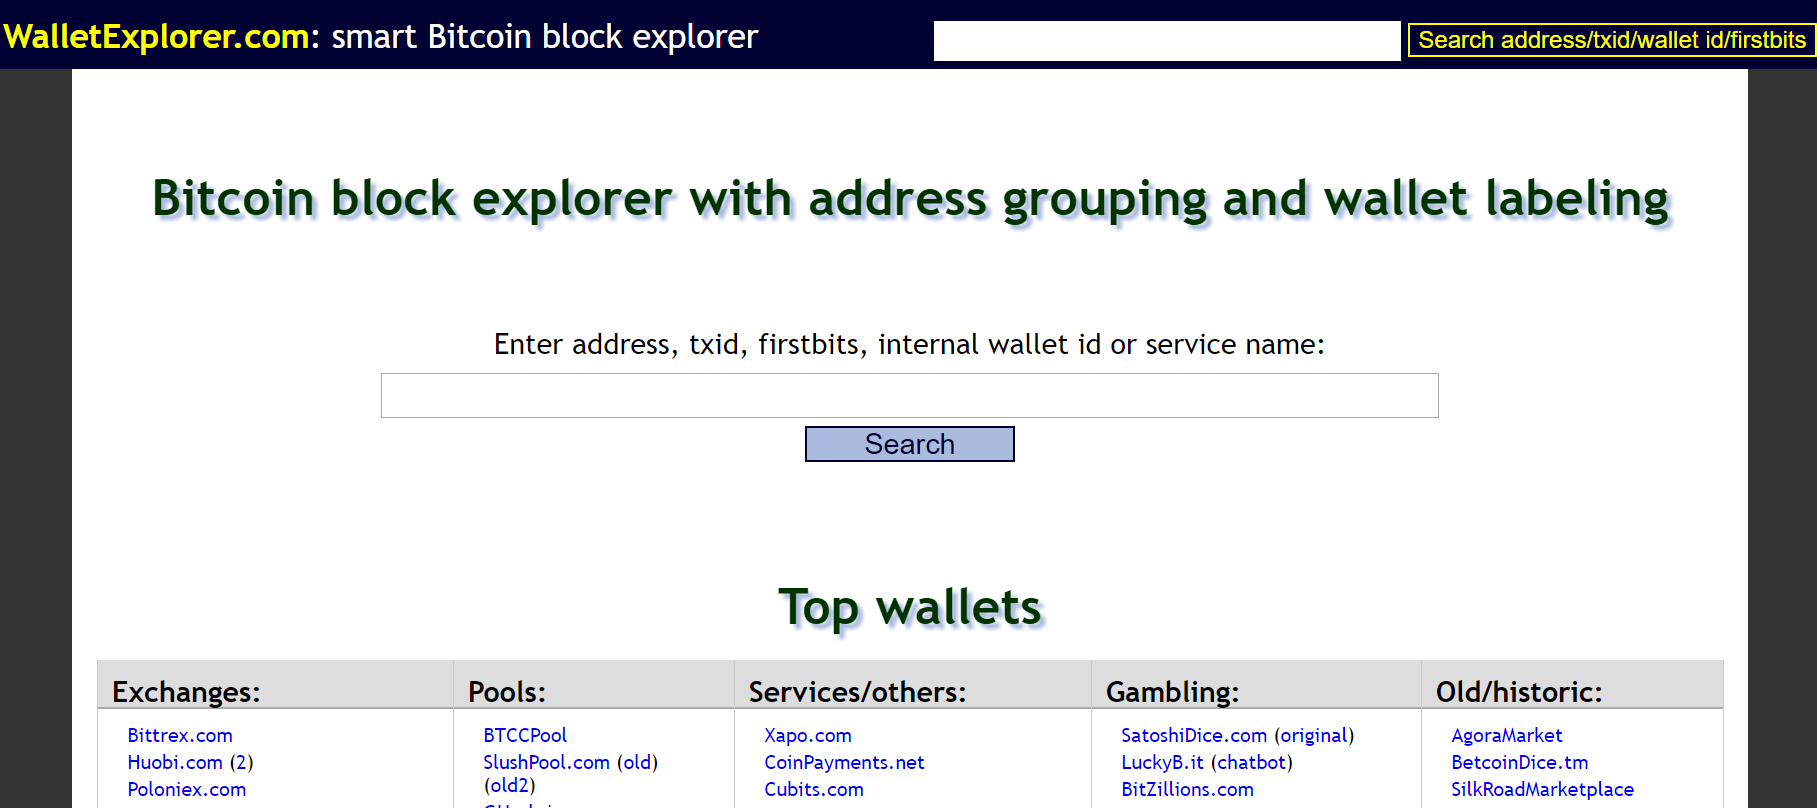 WalletExplorer